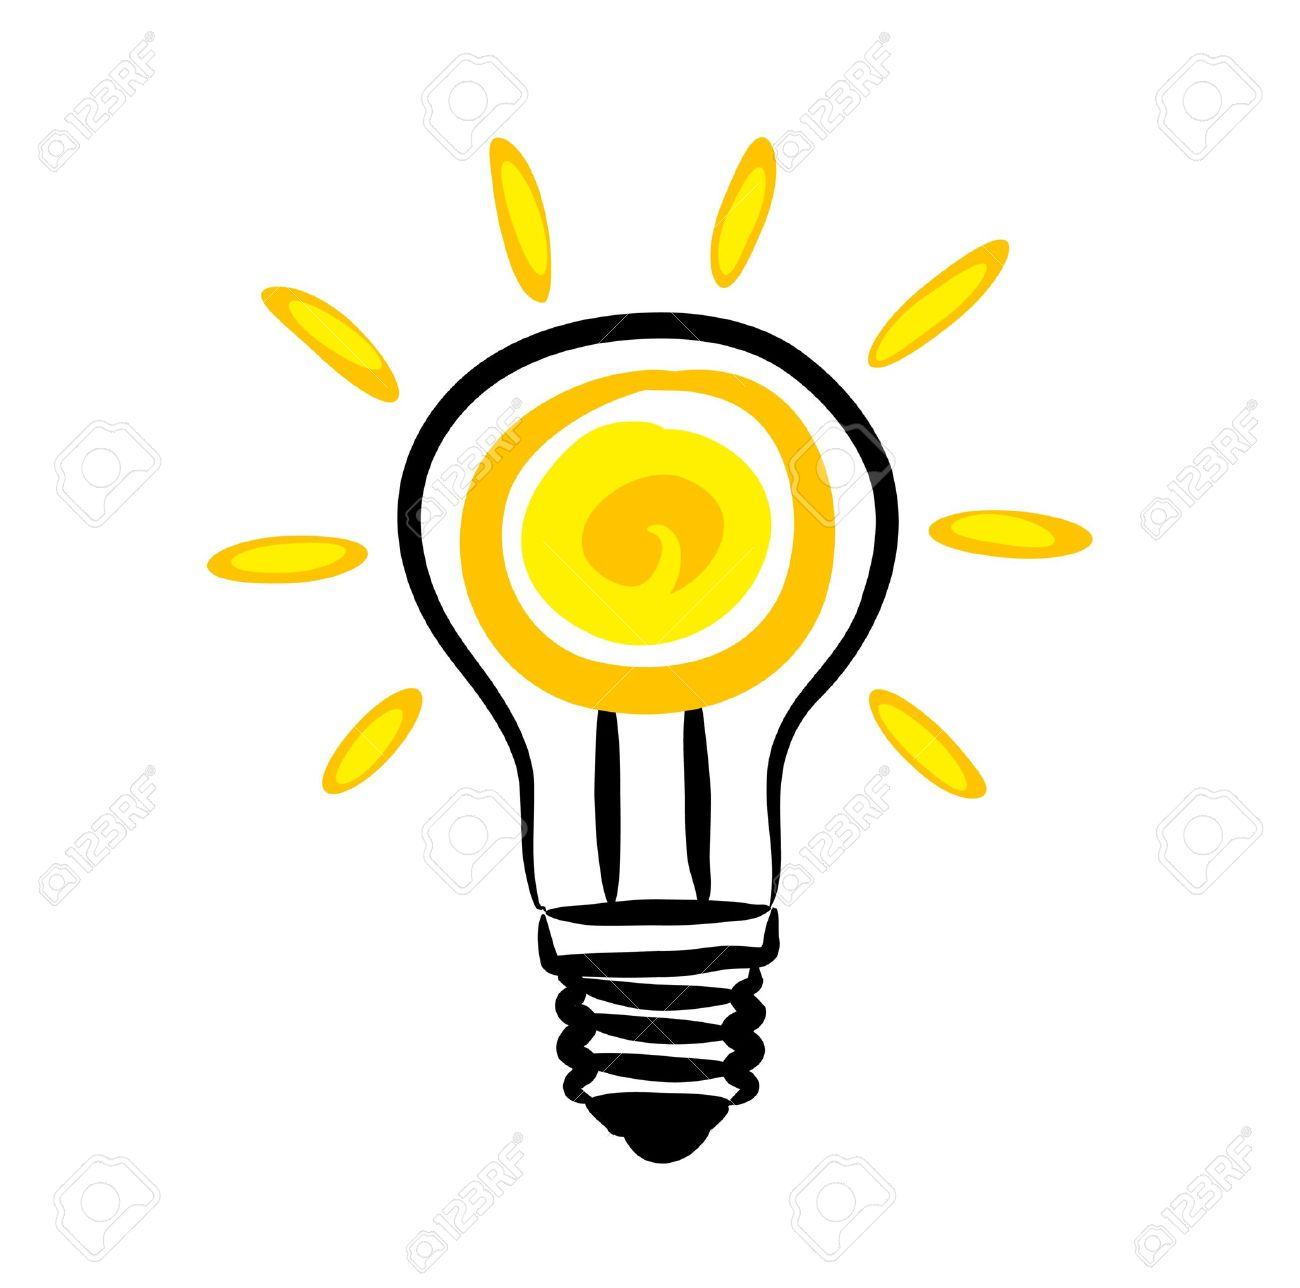 Light bulb icon - 15274680